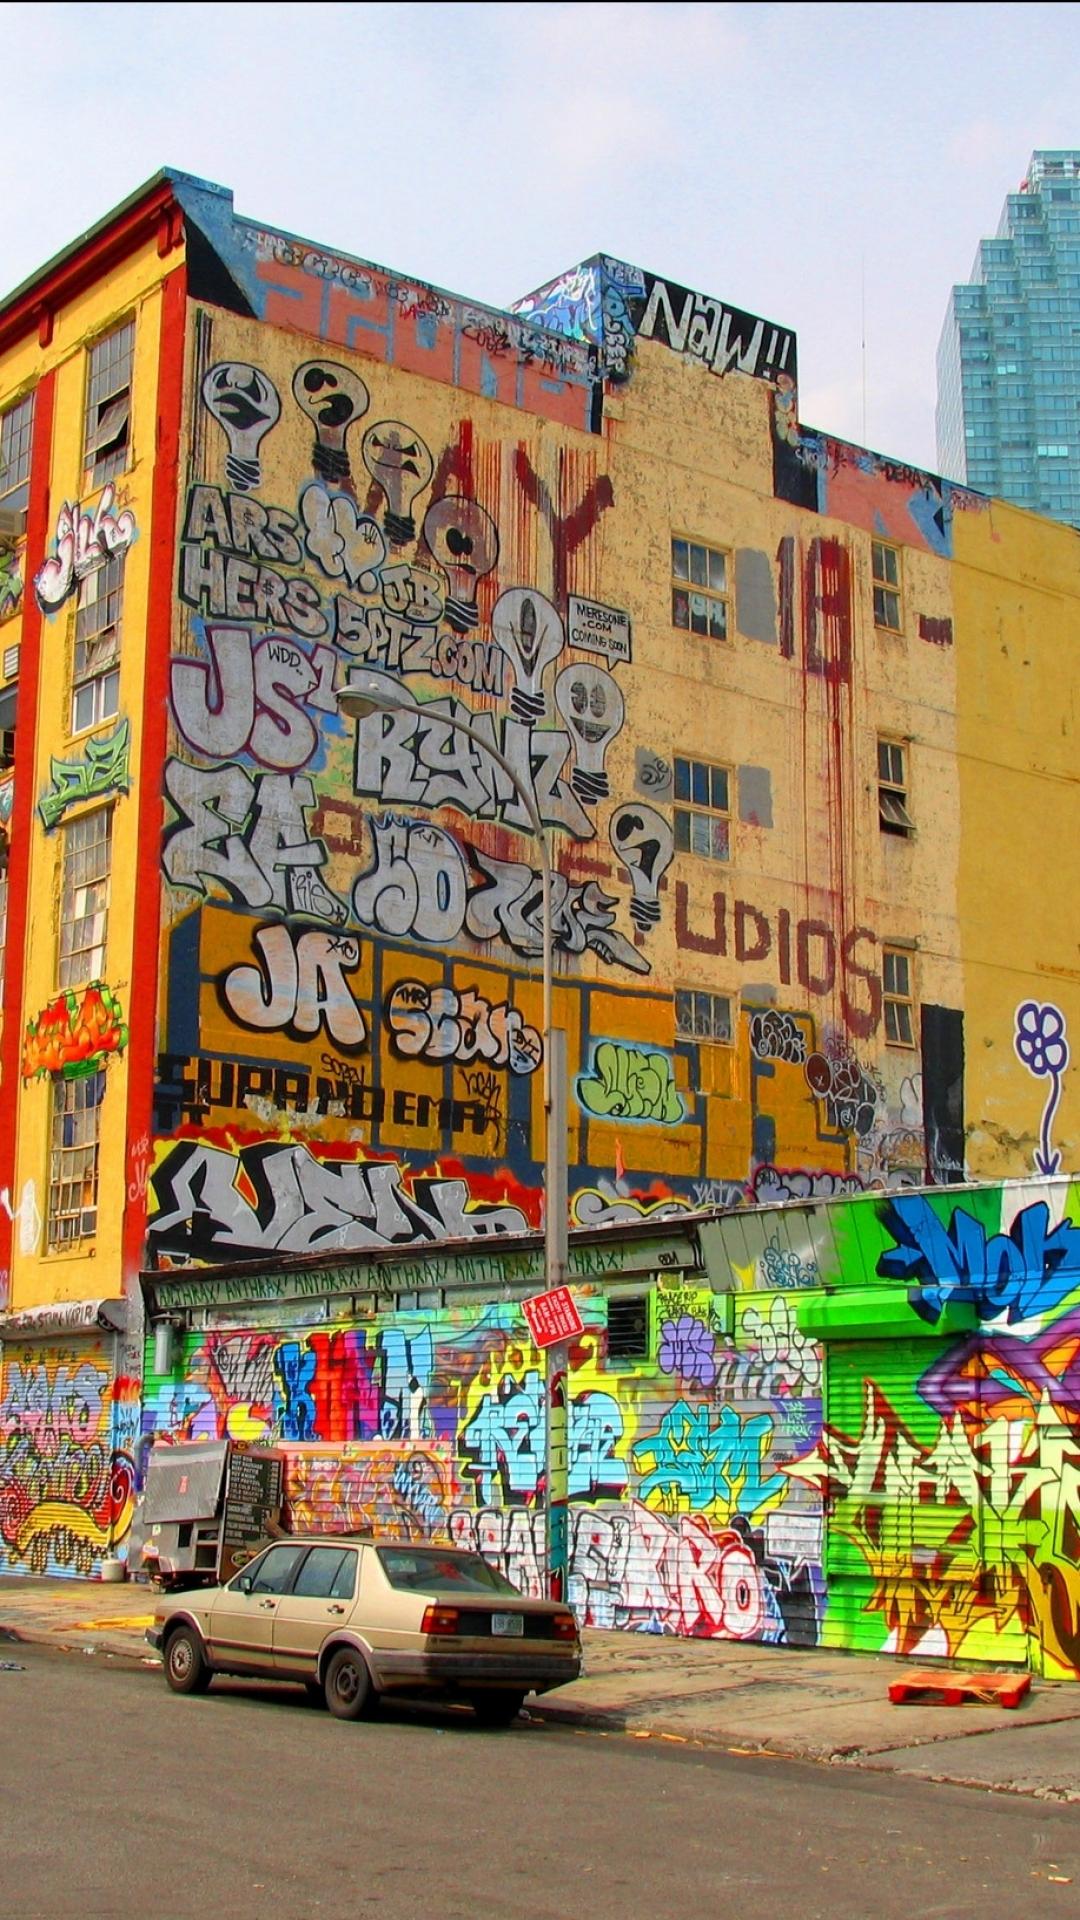 Graffiti art wallpaper iphone - Wallpaper 556432